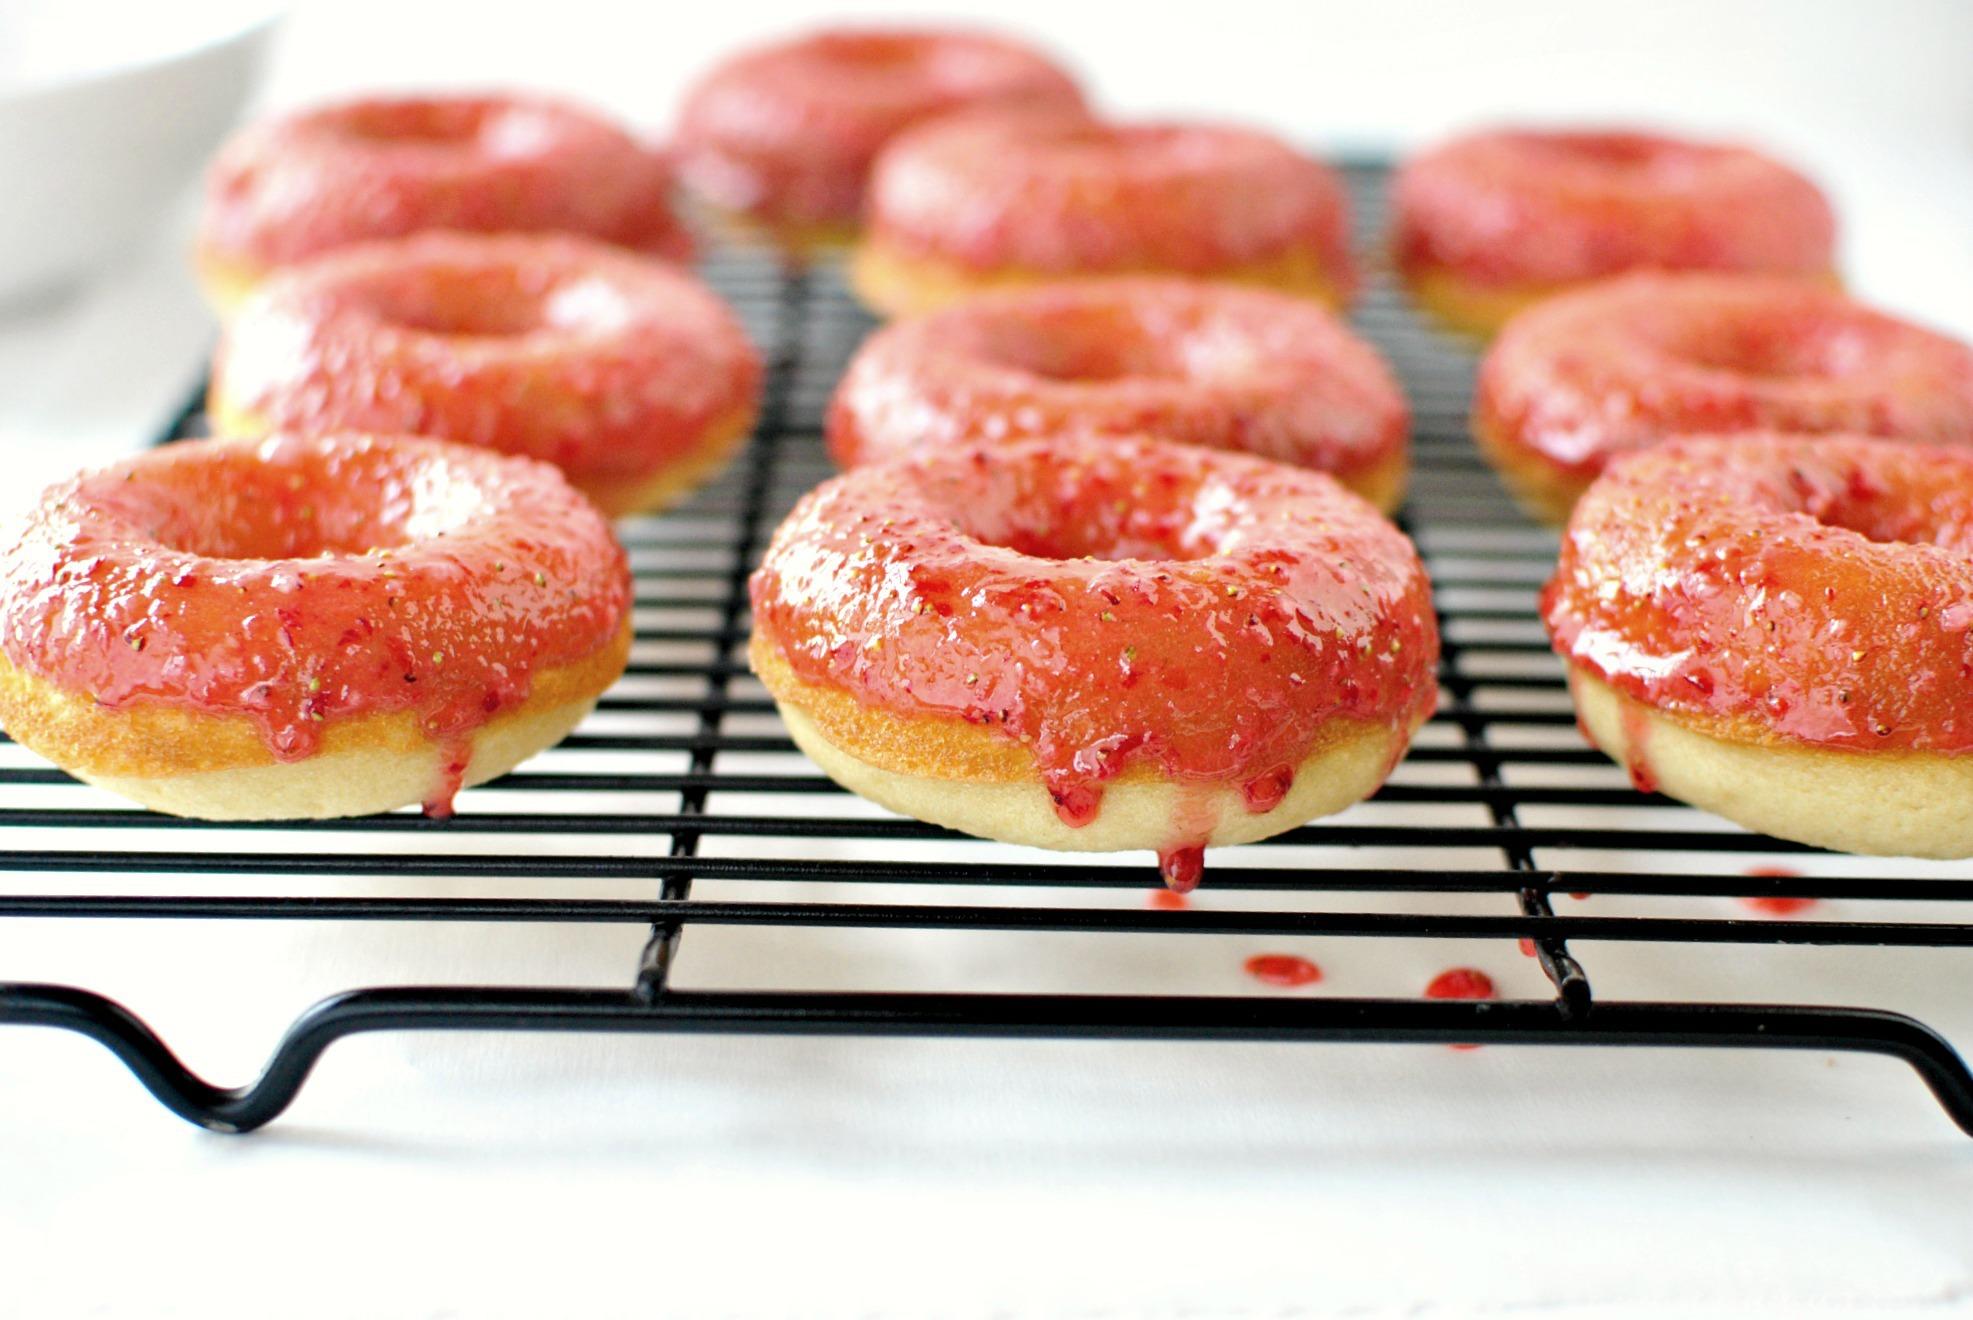 Simply Scratch Buttermilk Cake Doughnuts with Fresh Strawberry Glaze